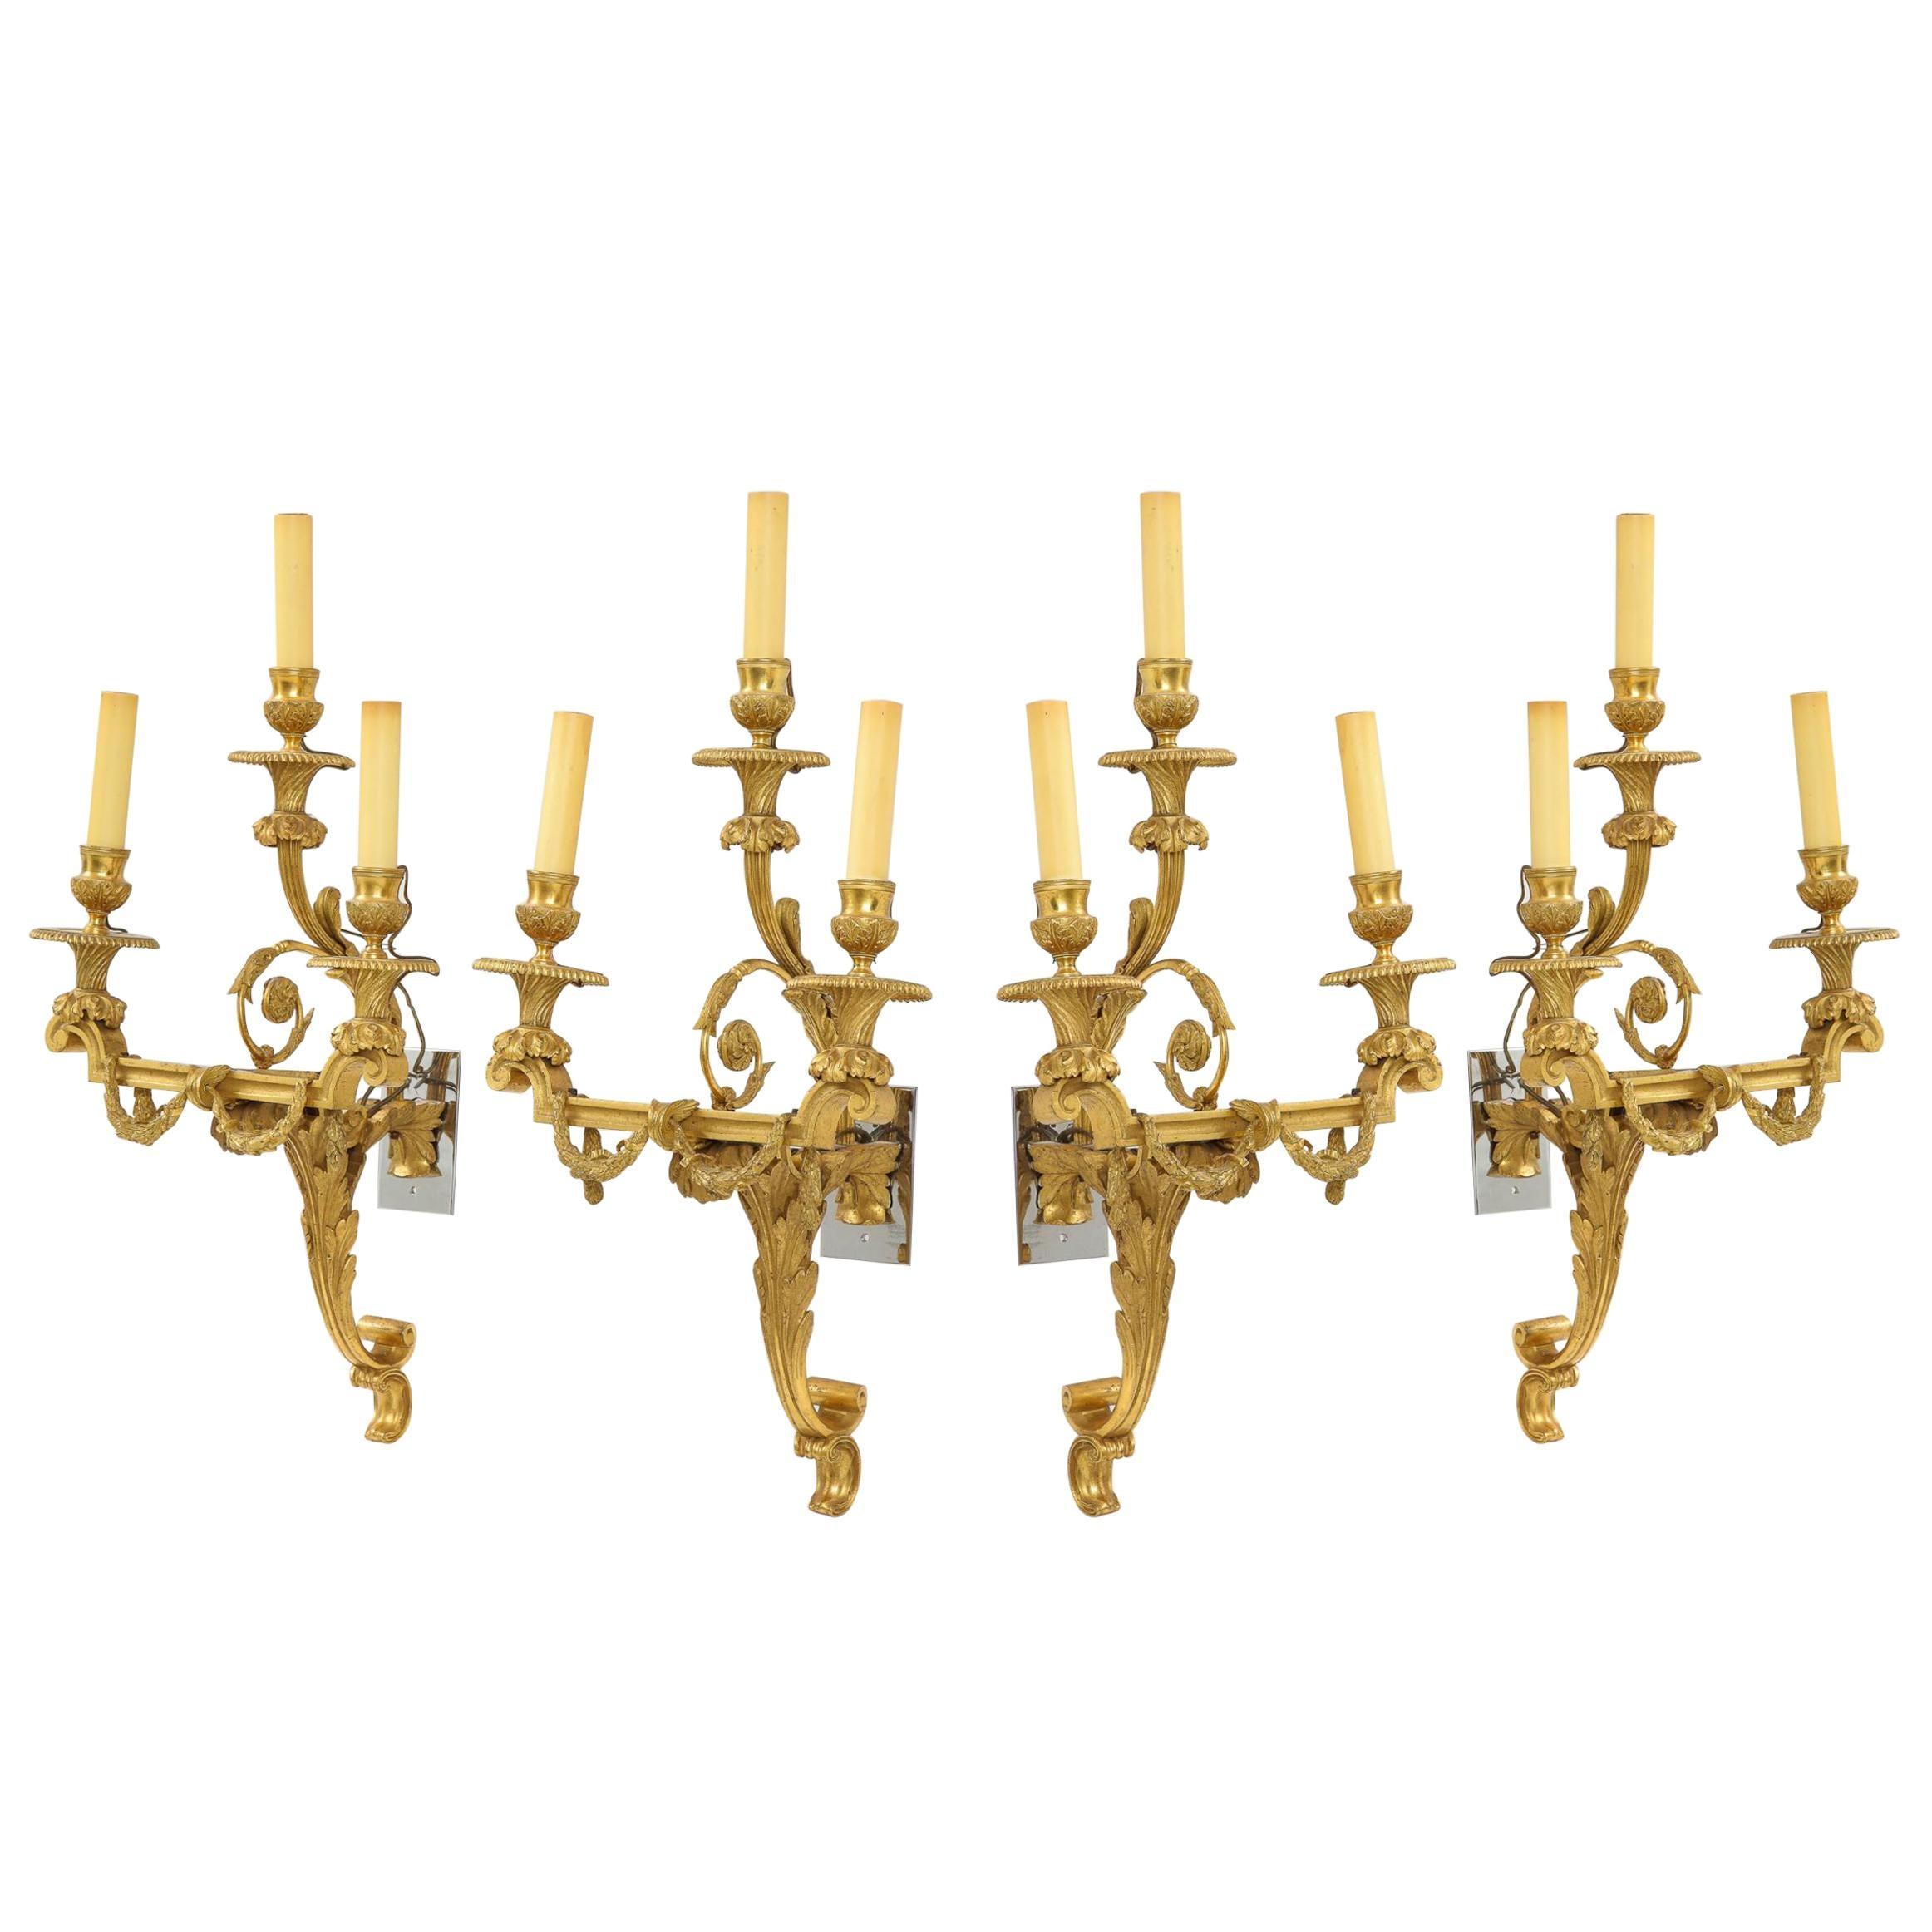 Very Fine Set of Four Gilt Bronze Louis XVI Sconces